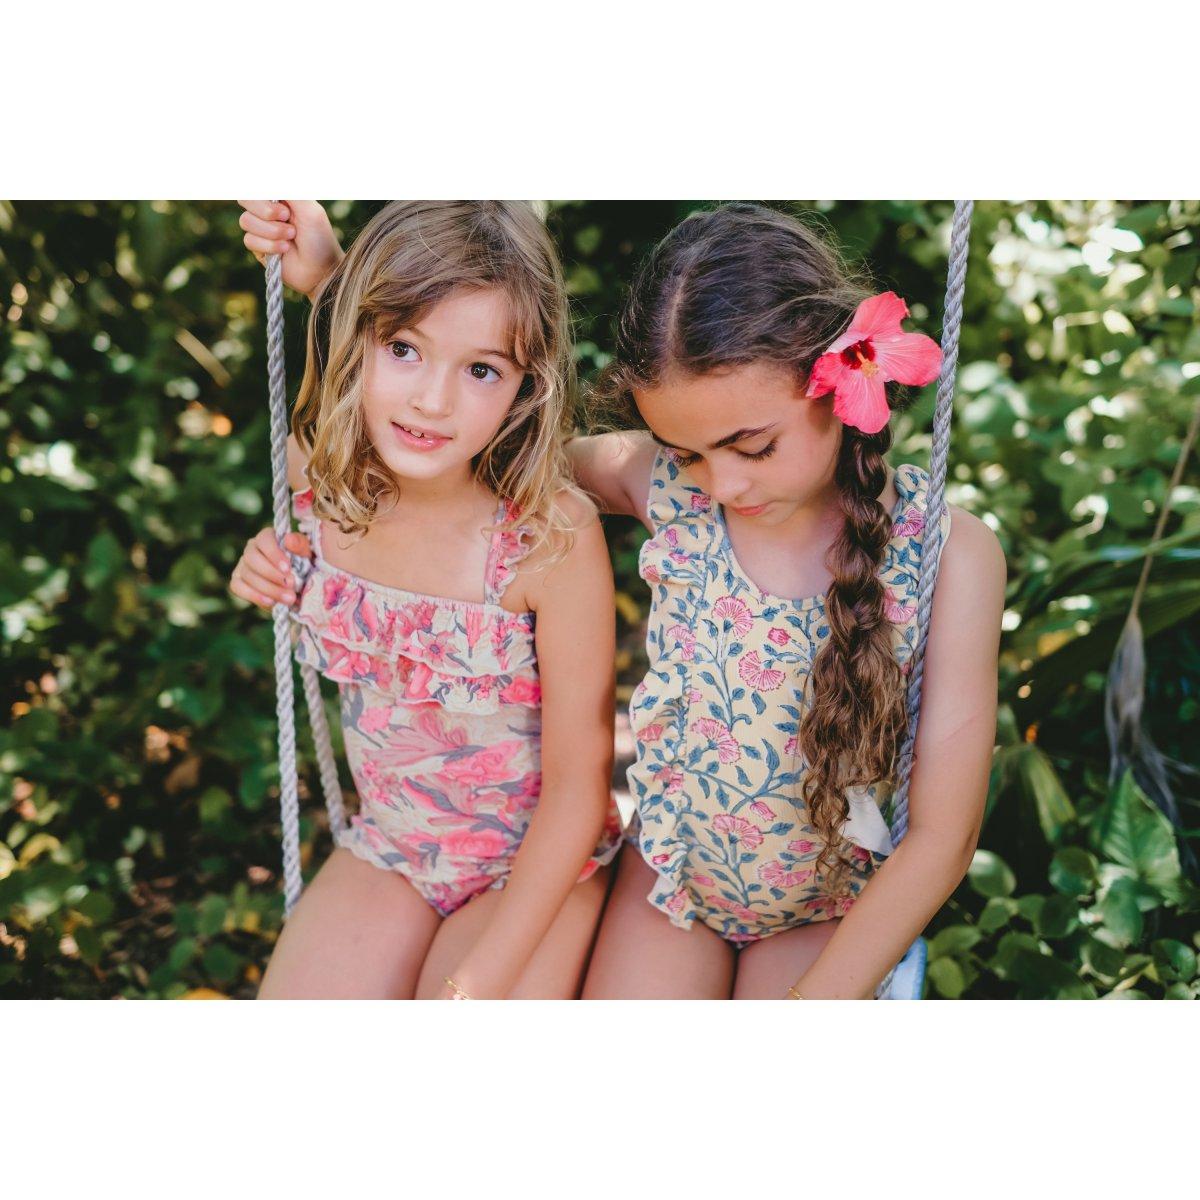 Kids Baby Girls Ruffles Floral Print One Piece Swimwear Juesi Swimsuit for Girls